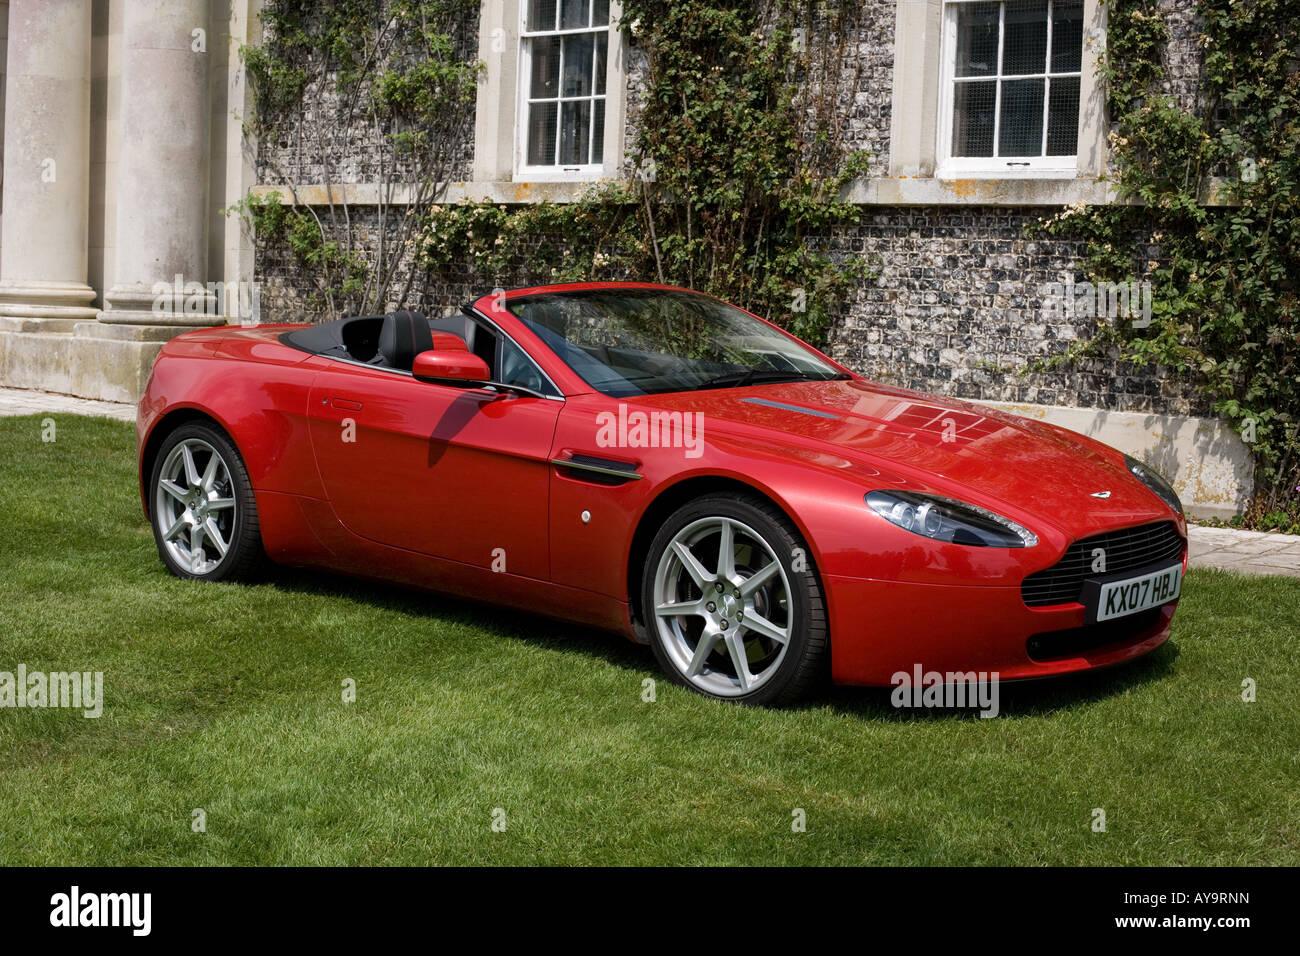 Aston Martin V8 Vantage Roadster Red Stock Photo Alamy